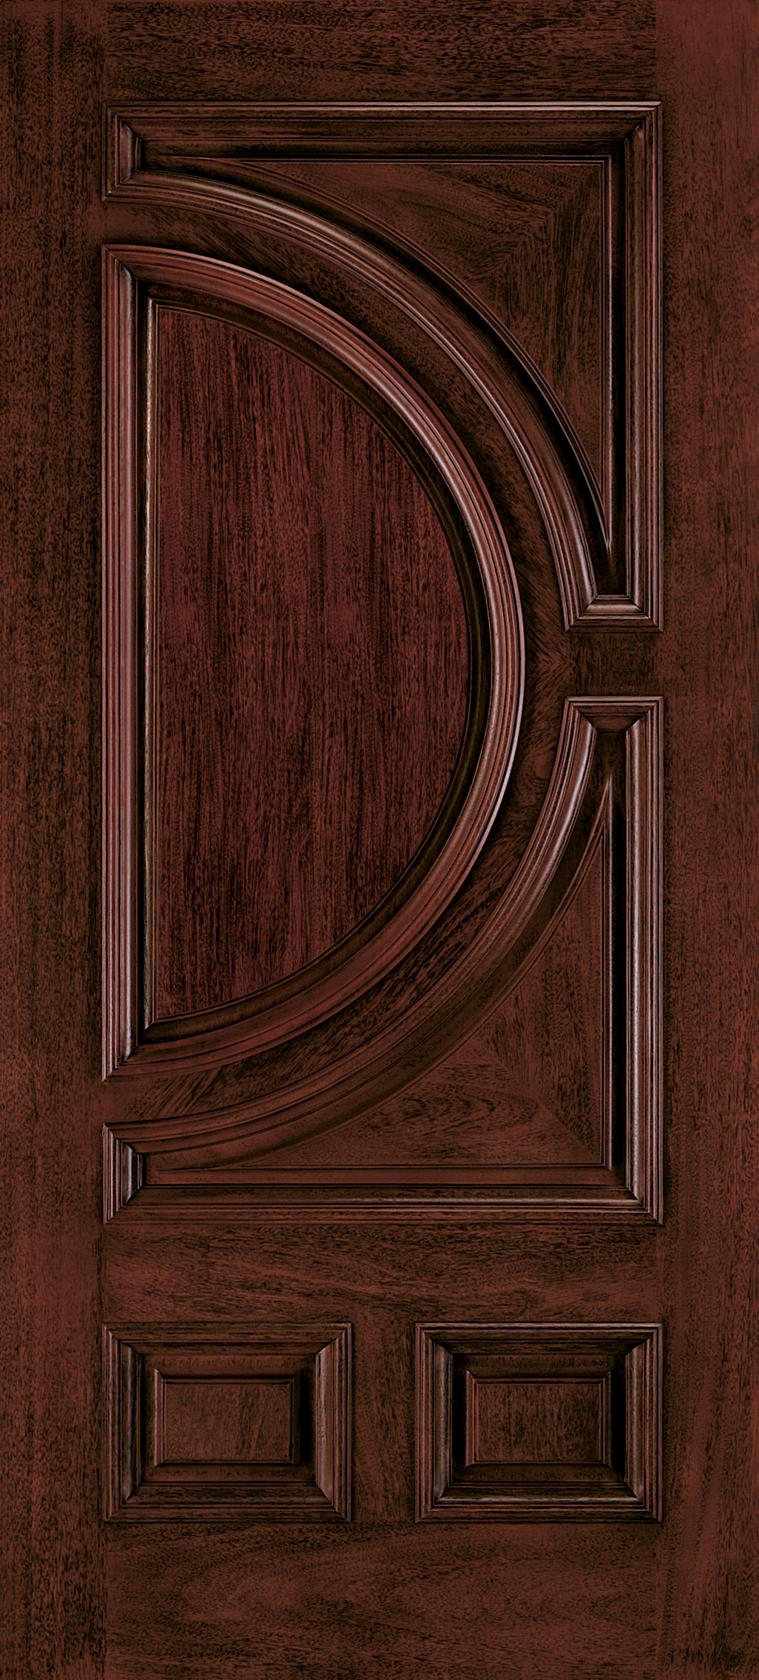 Aurora Custom Fiberglass All Panel Exterior Door Jeld Wen Windows Doors Exterior Doors Fiberglass Exterior Doors Single Door Design